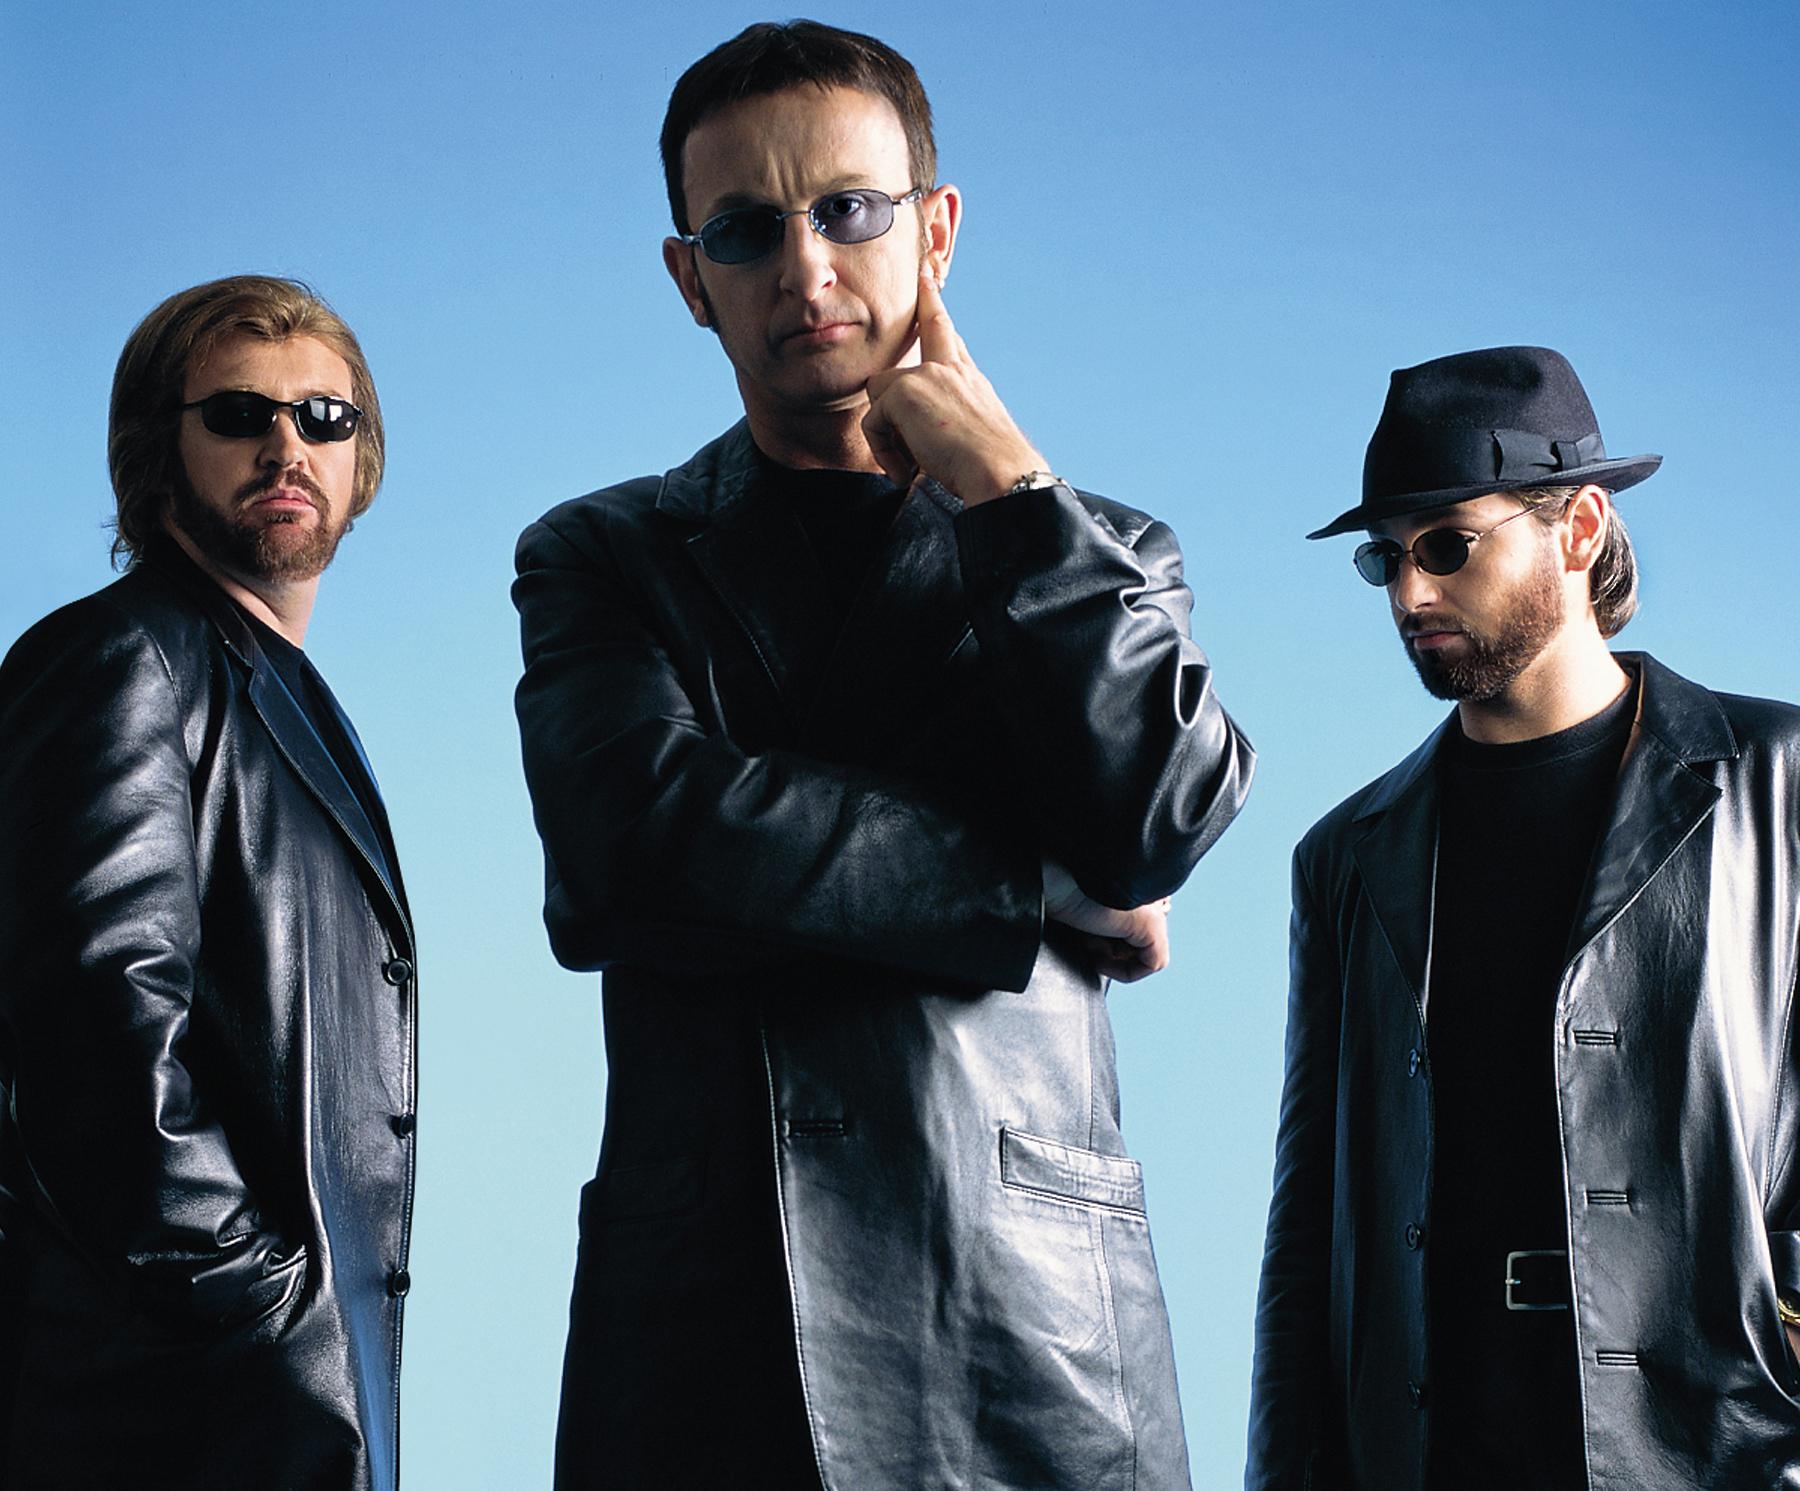 Australian Bee Gees Show Debuts At Balboa Theatre